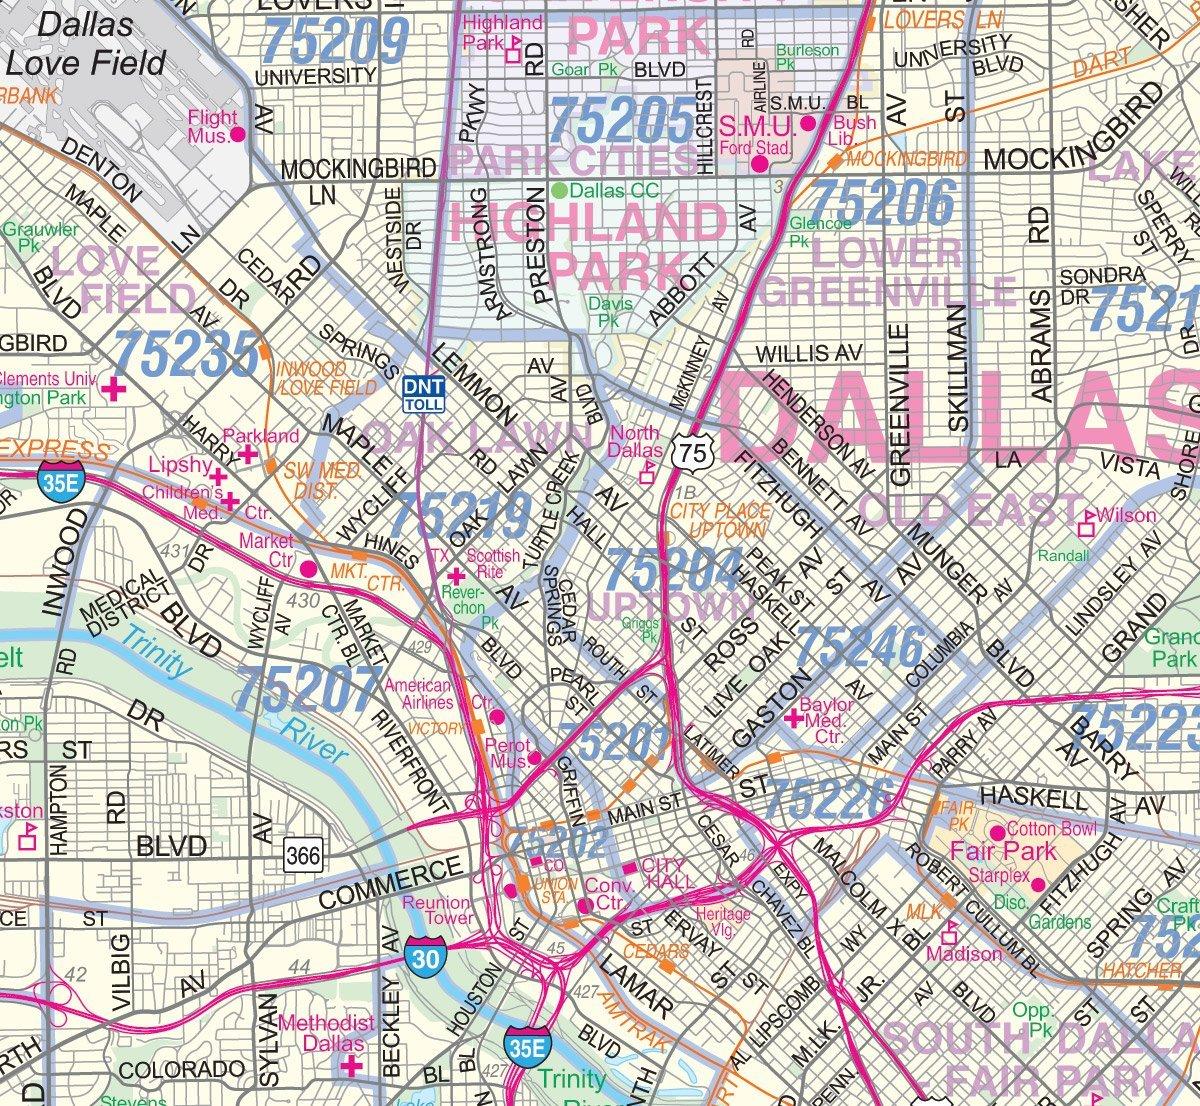 map of dfw dfw maps my blog dfw map fdaabcdaadefd - dfw zip code map kean university map